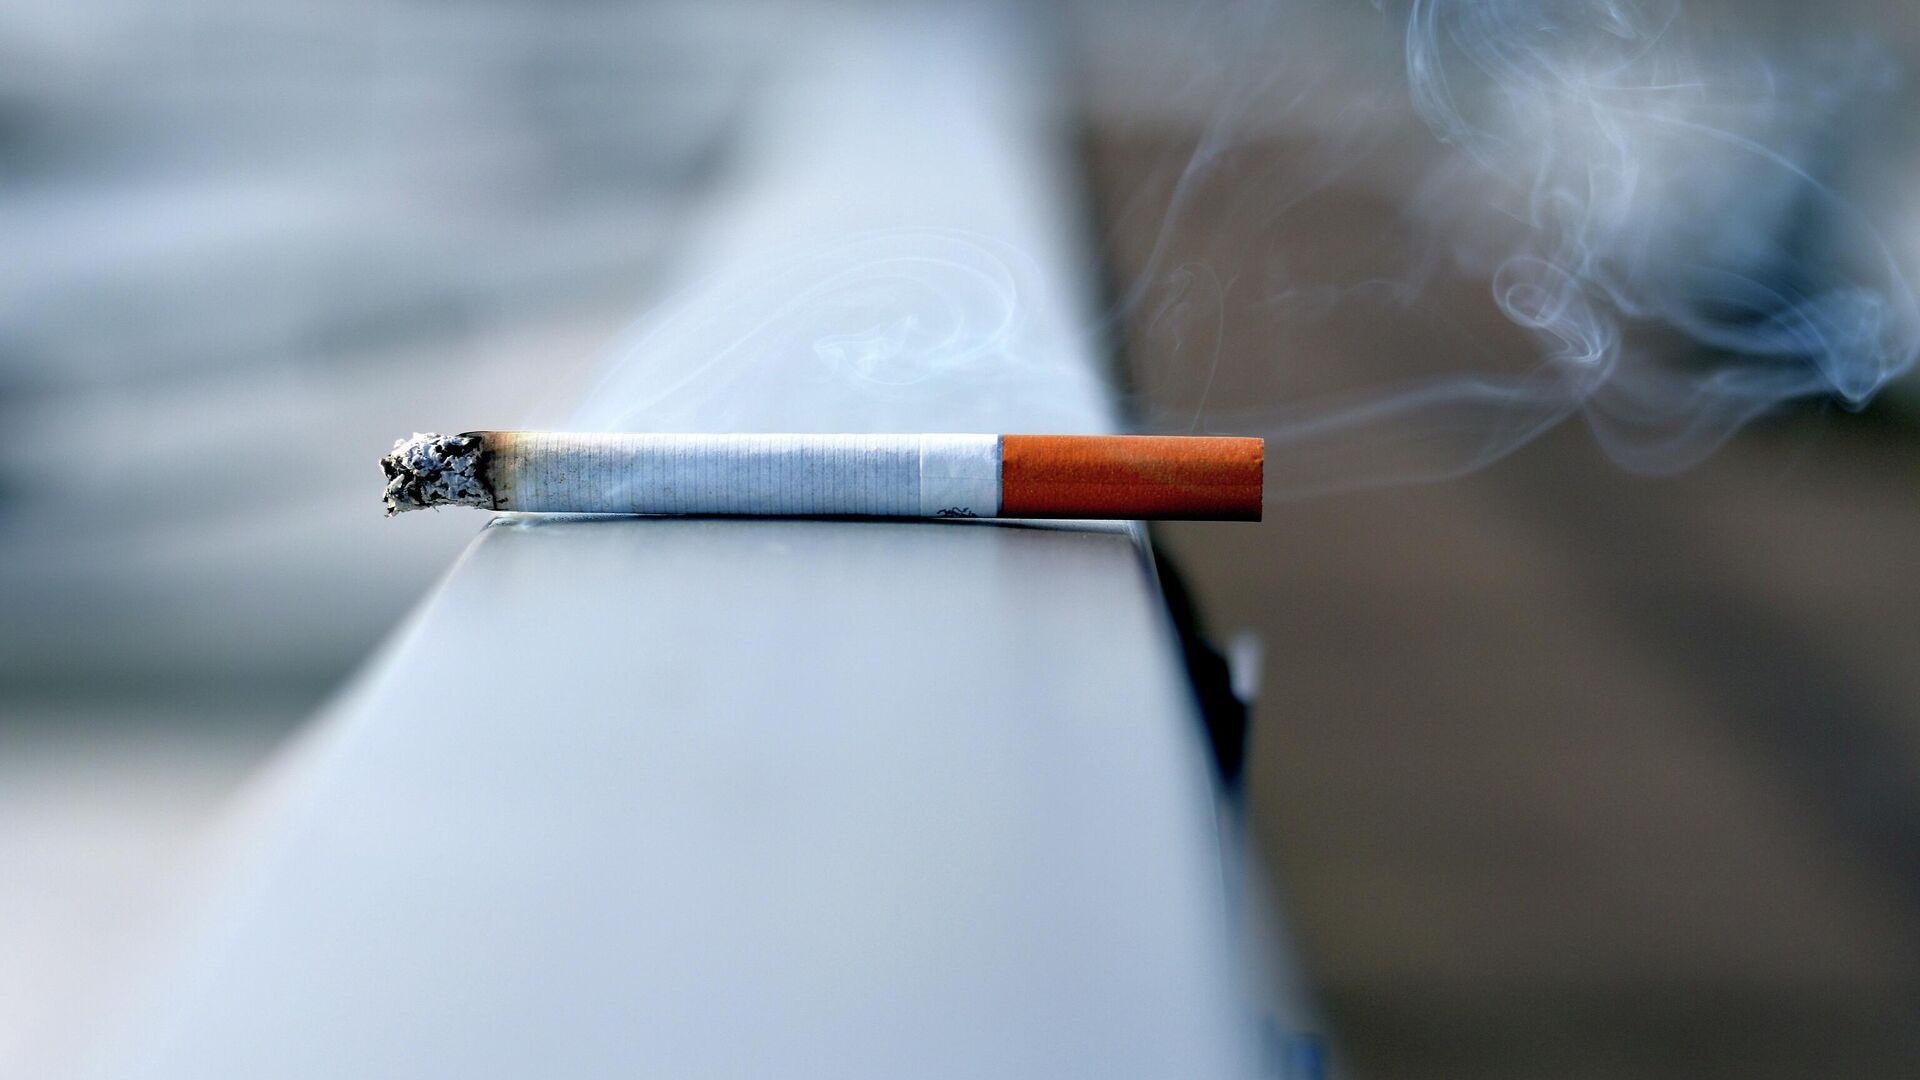 Un cigarrillo, imagen referencial - Sputnik Mundo, 1920, 25.06.2021